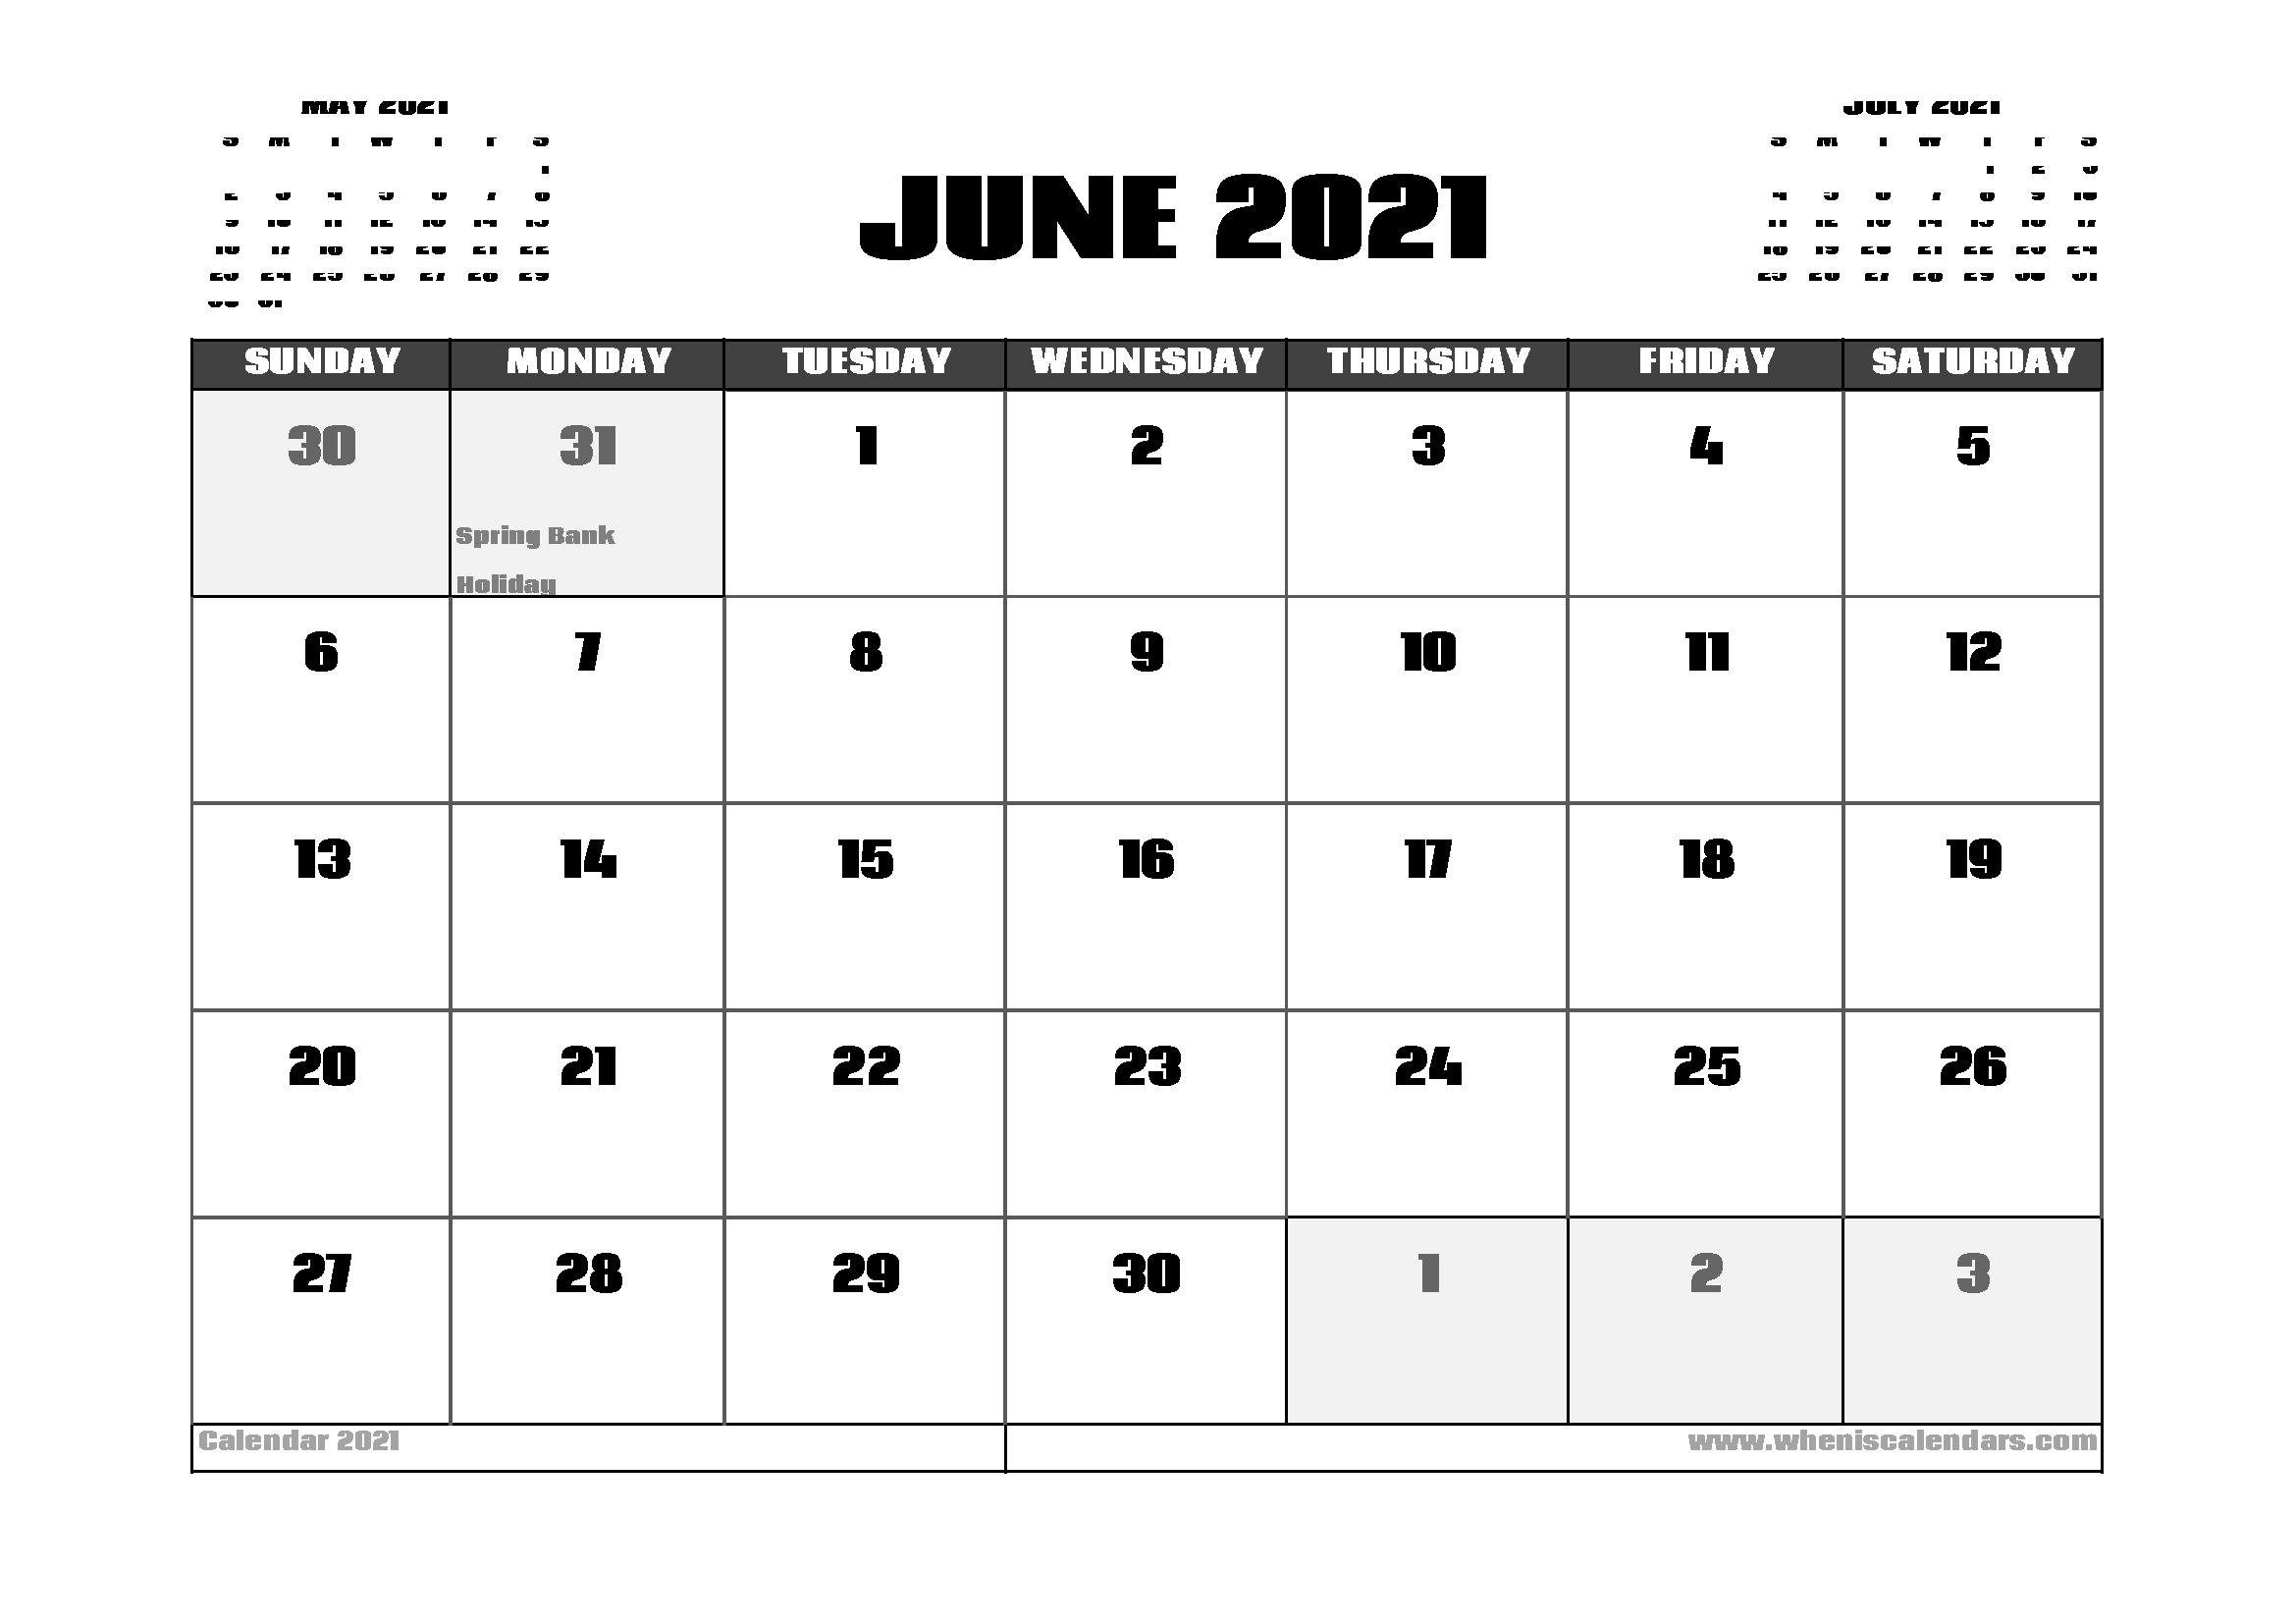 June 2021 Calendar UK with Holidays